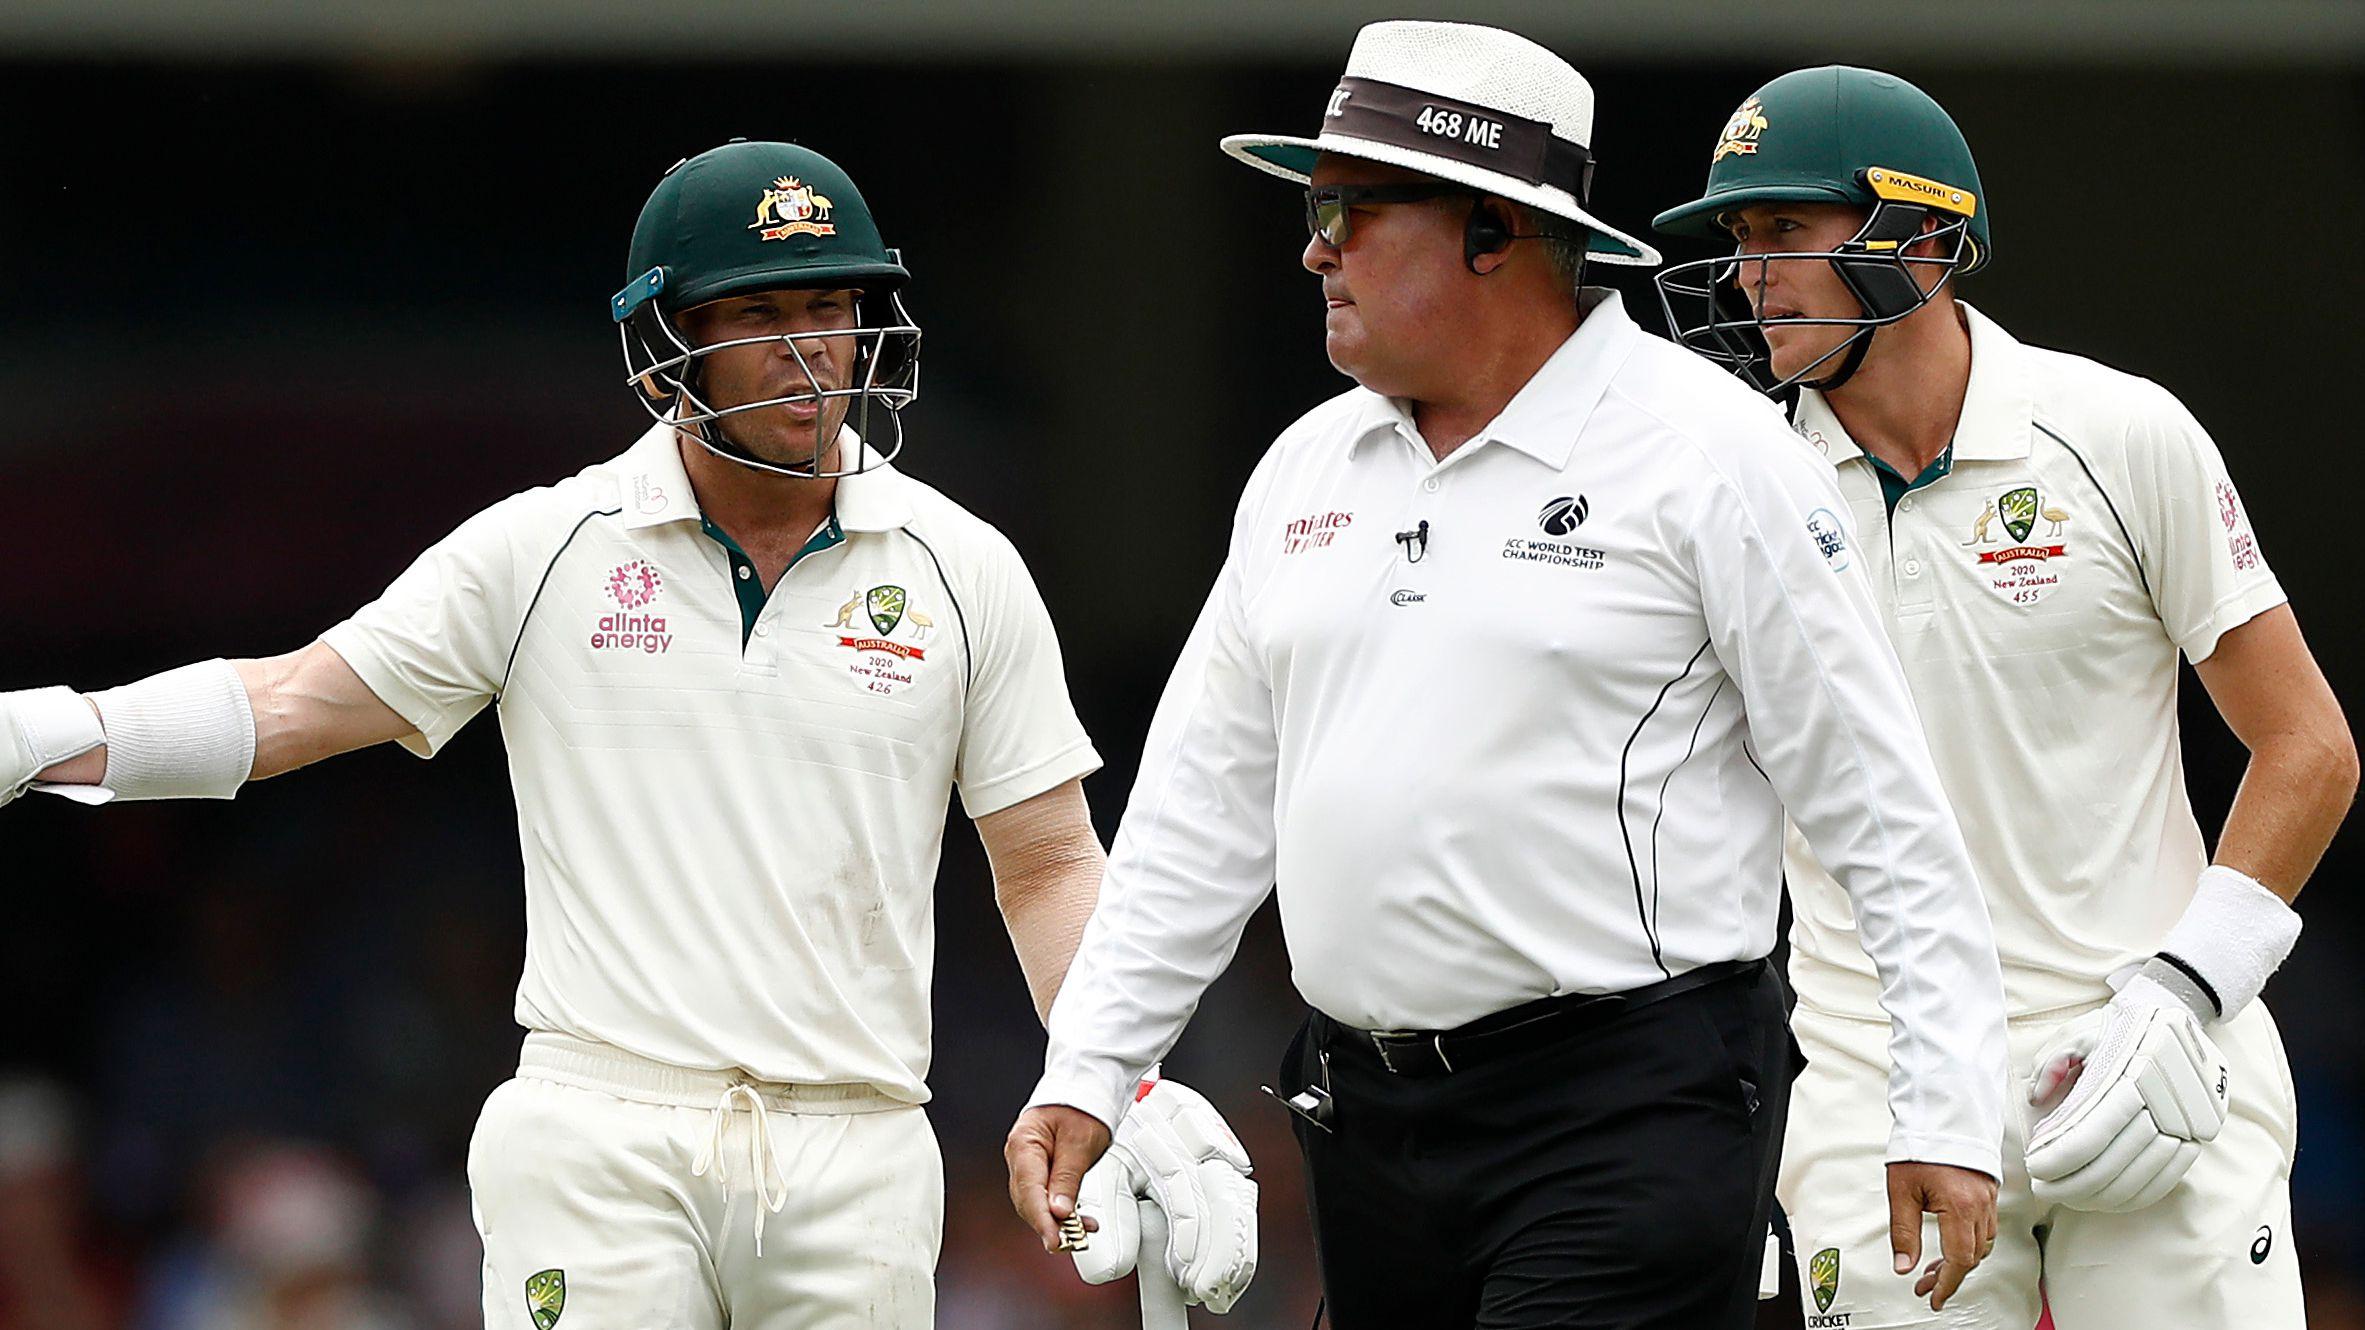 Australia docked five runs as David Warner penalised for running on SCG pitch